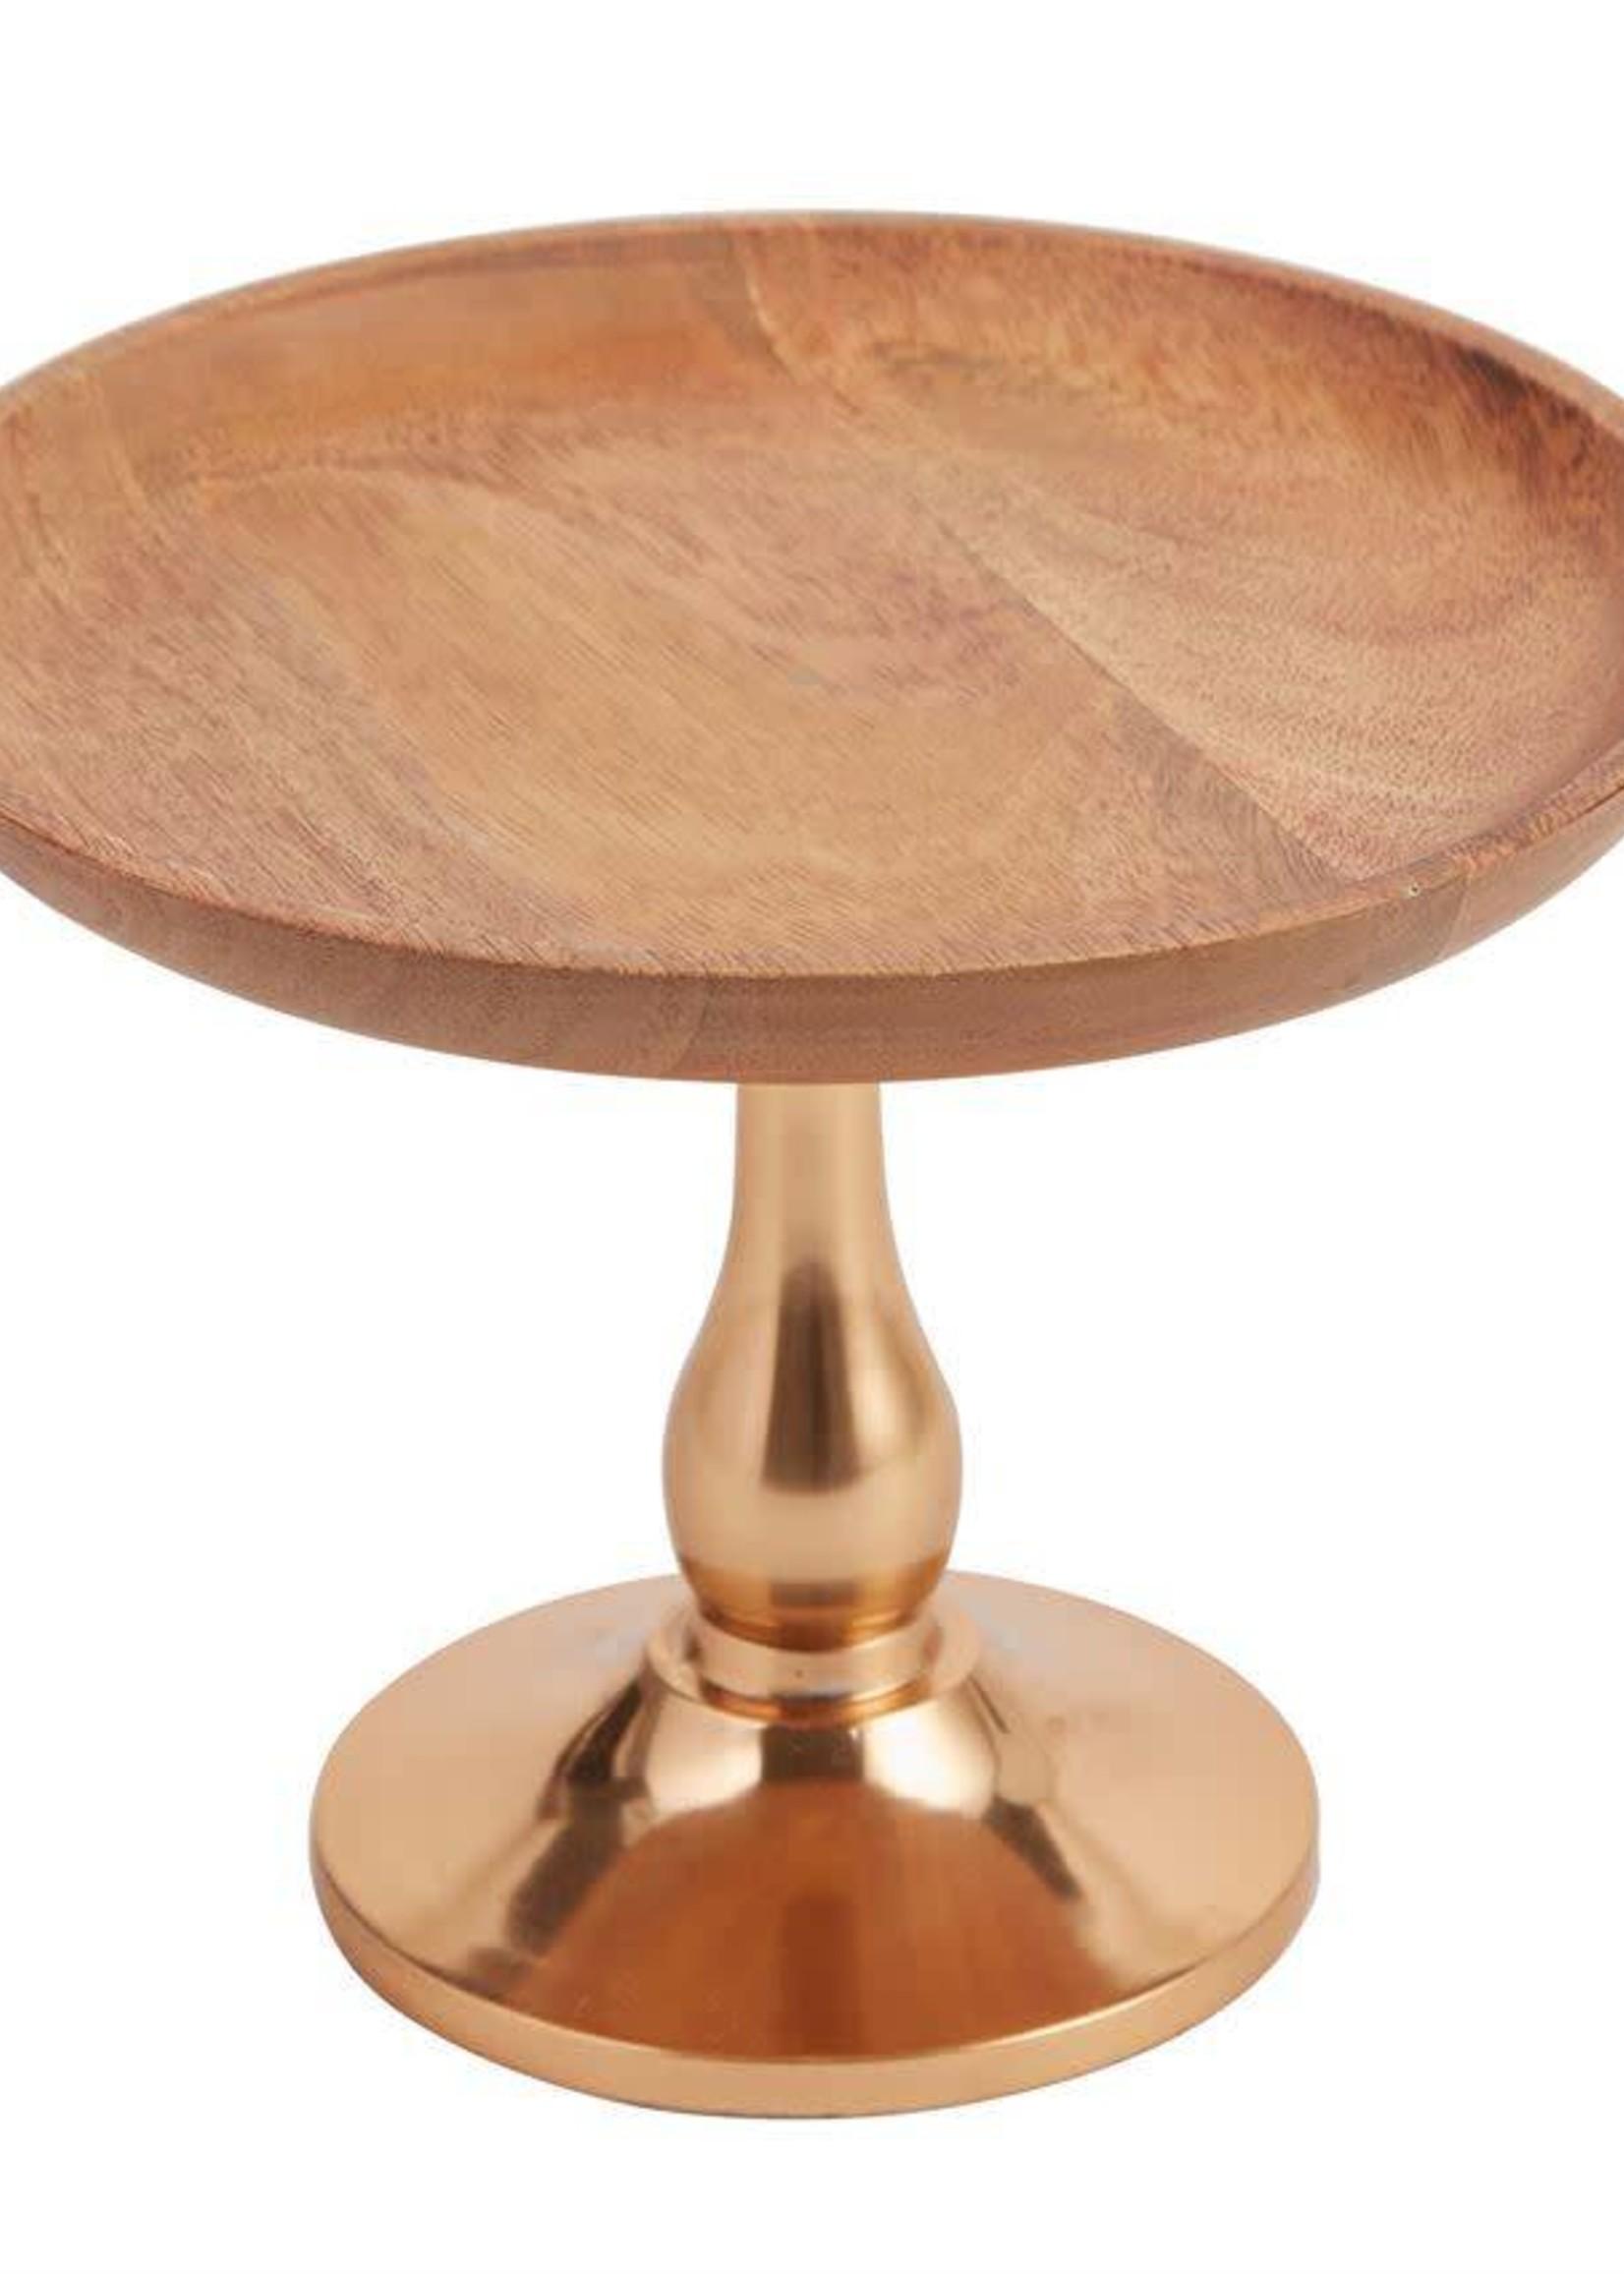 Mud Pie Copper Pedestal